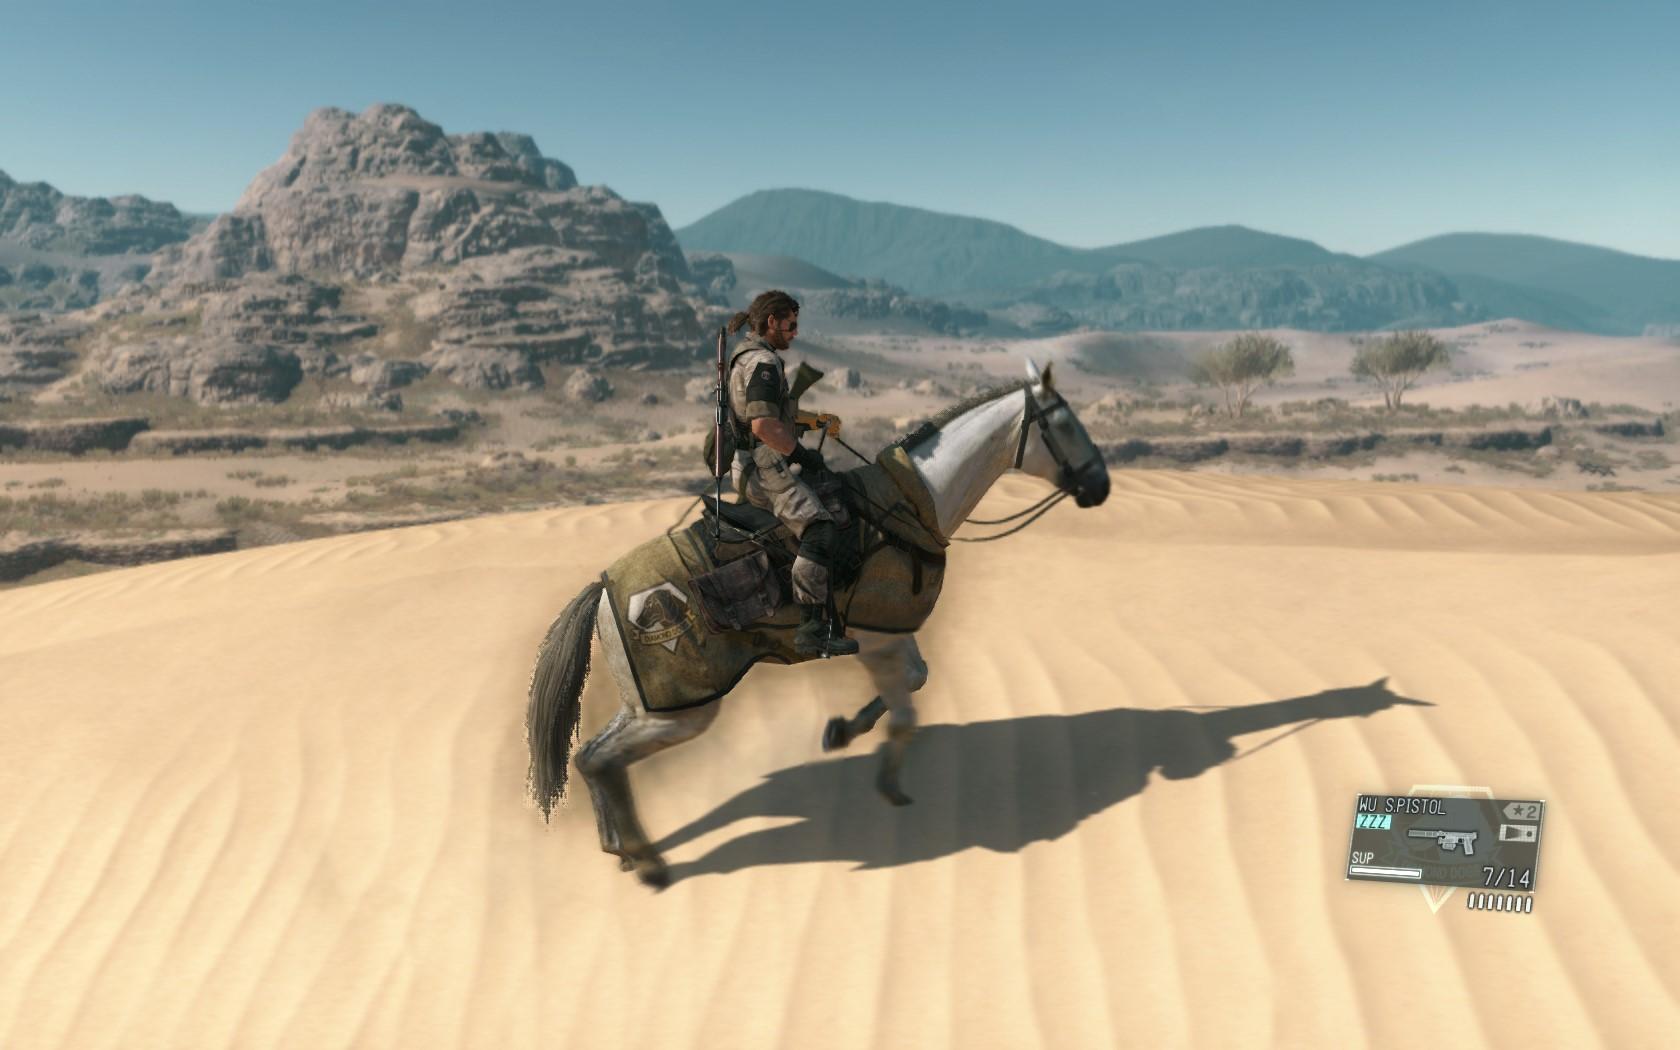 Metal_Gear_Solid_5_screenshot_001